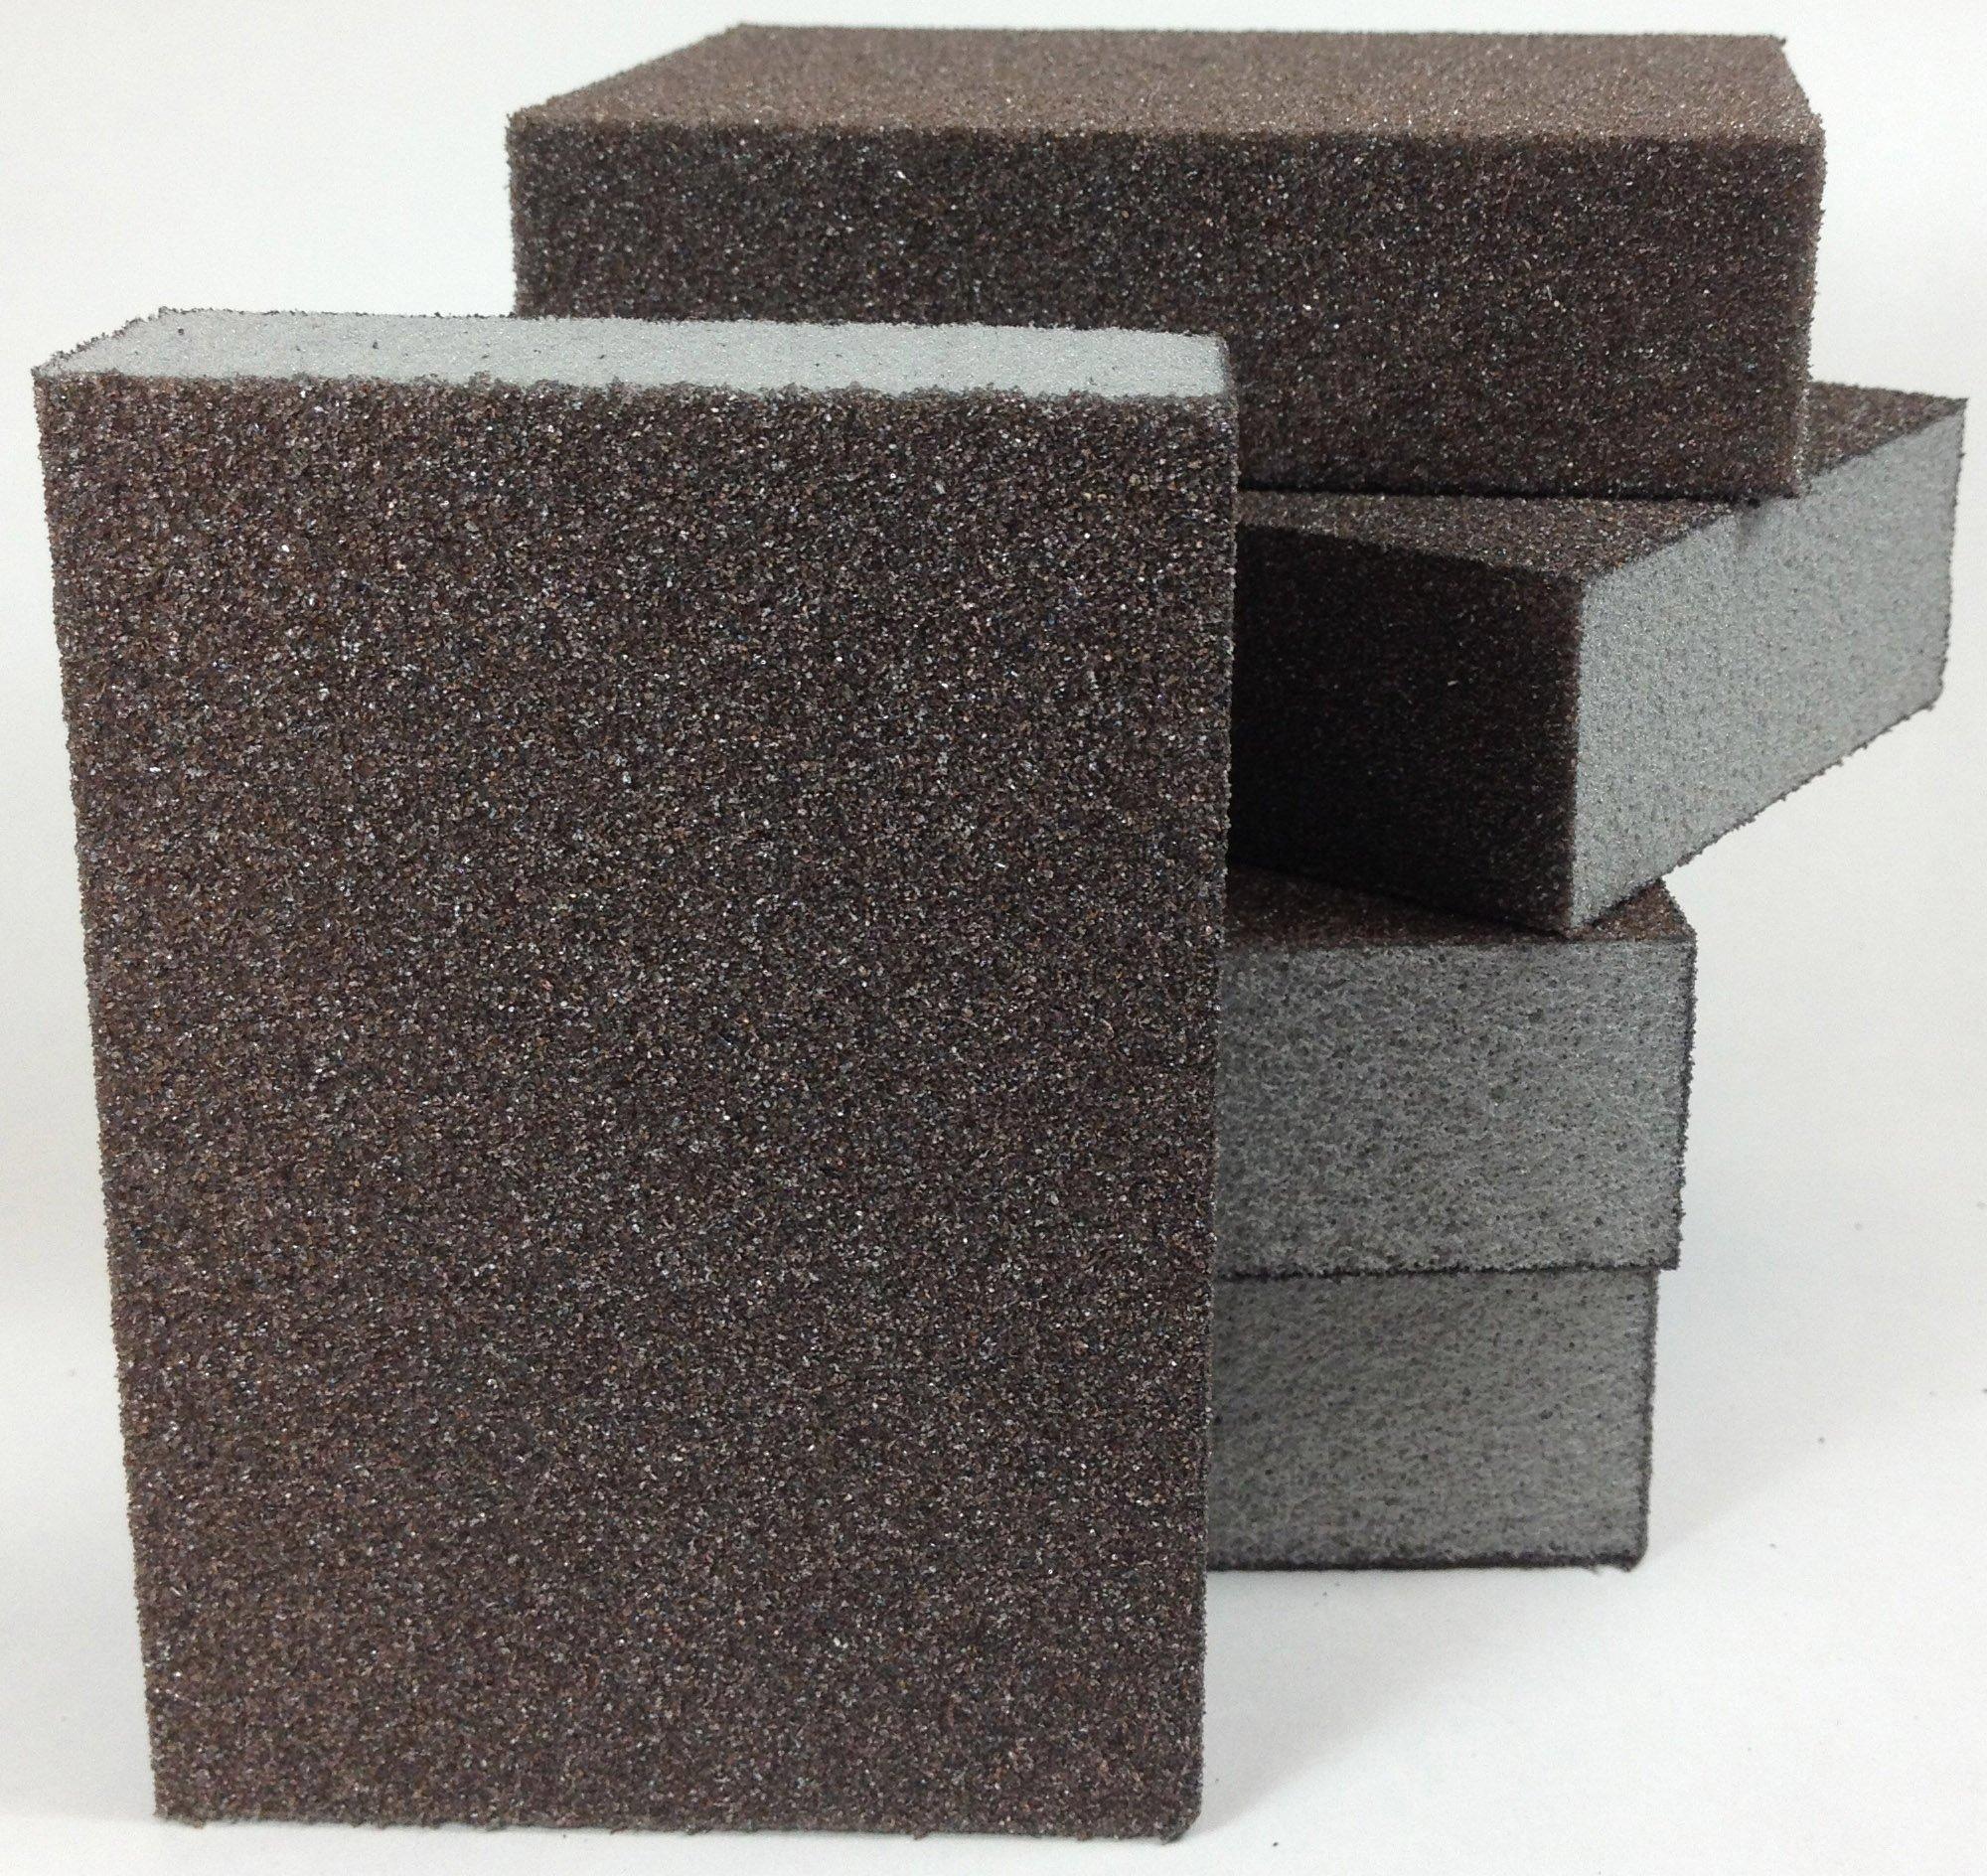 4 Sided Sanding Block, Pack of 5 Foam Block, Sponge Pad, Hand Sanding Tool (60 Grit Medium)